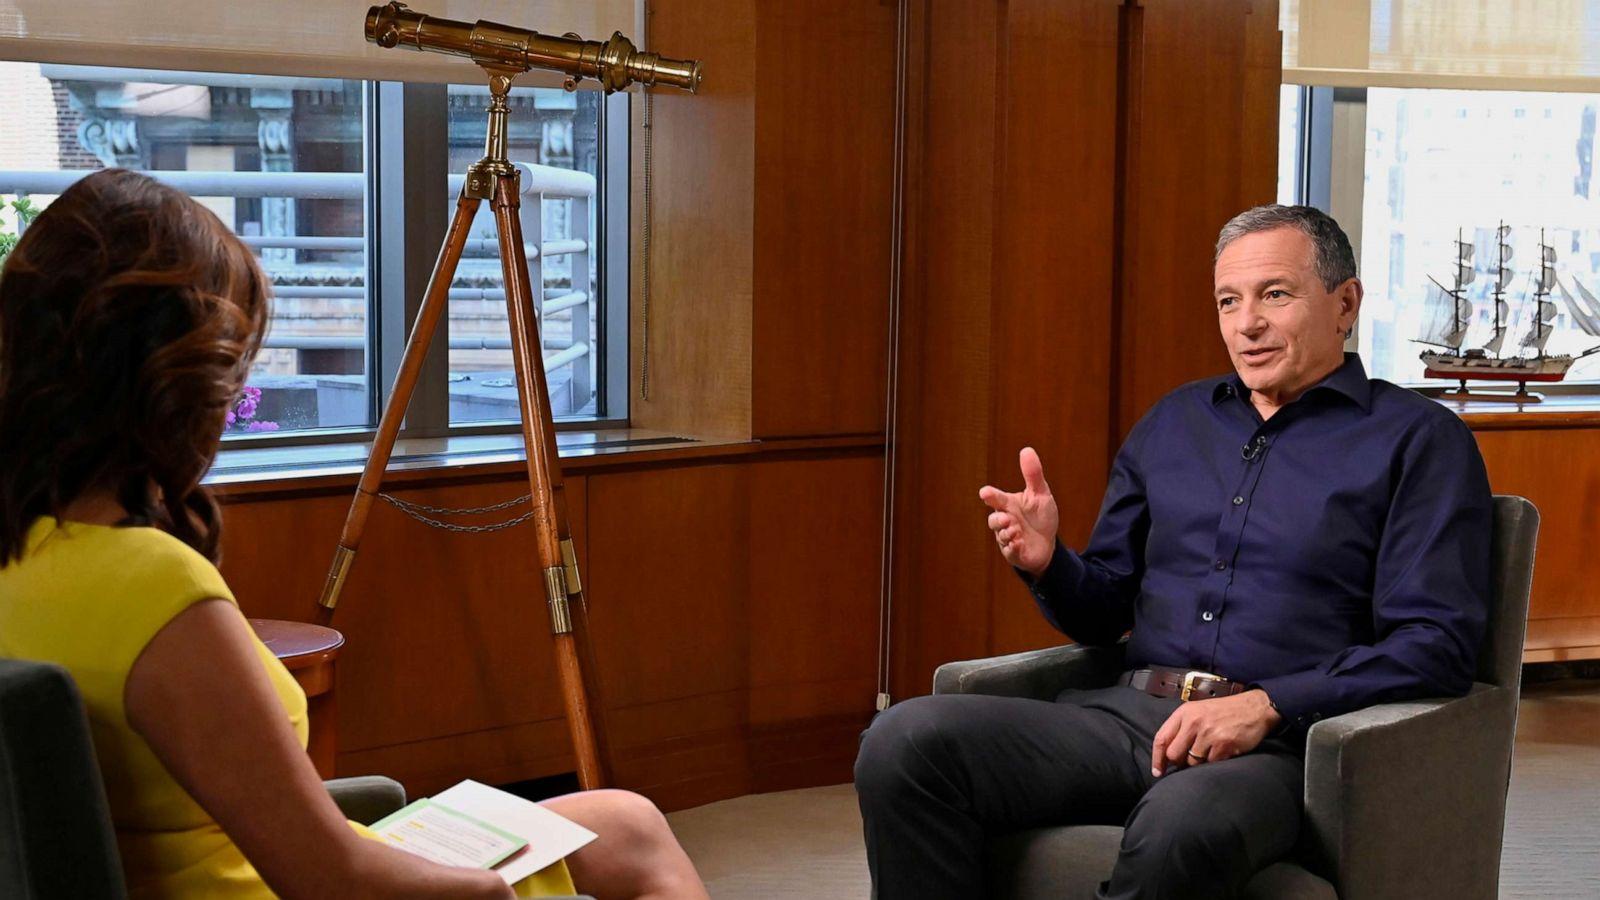 Disney Ceo Bob Iger Talks Career Highlights Retirement Ahead Of Memoir Release Abc News